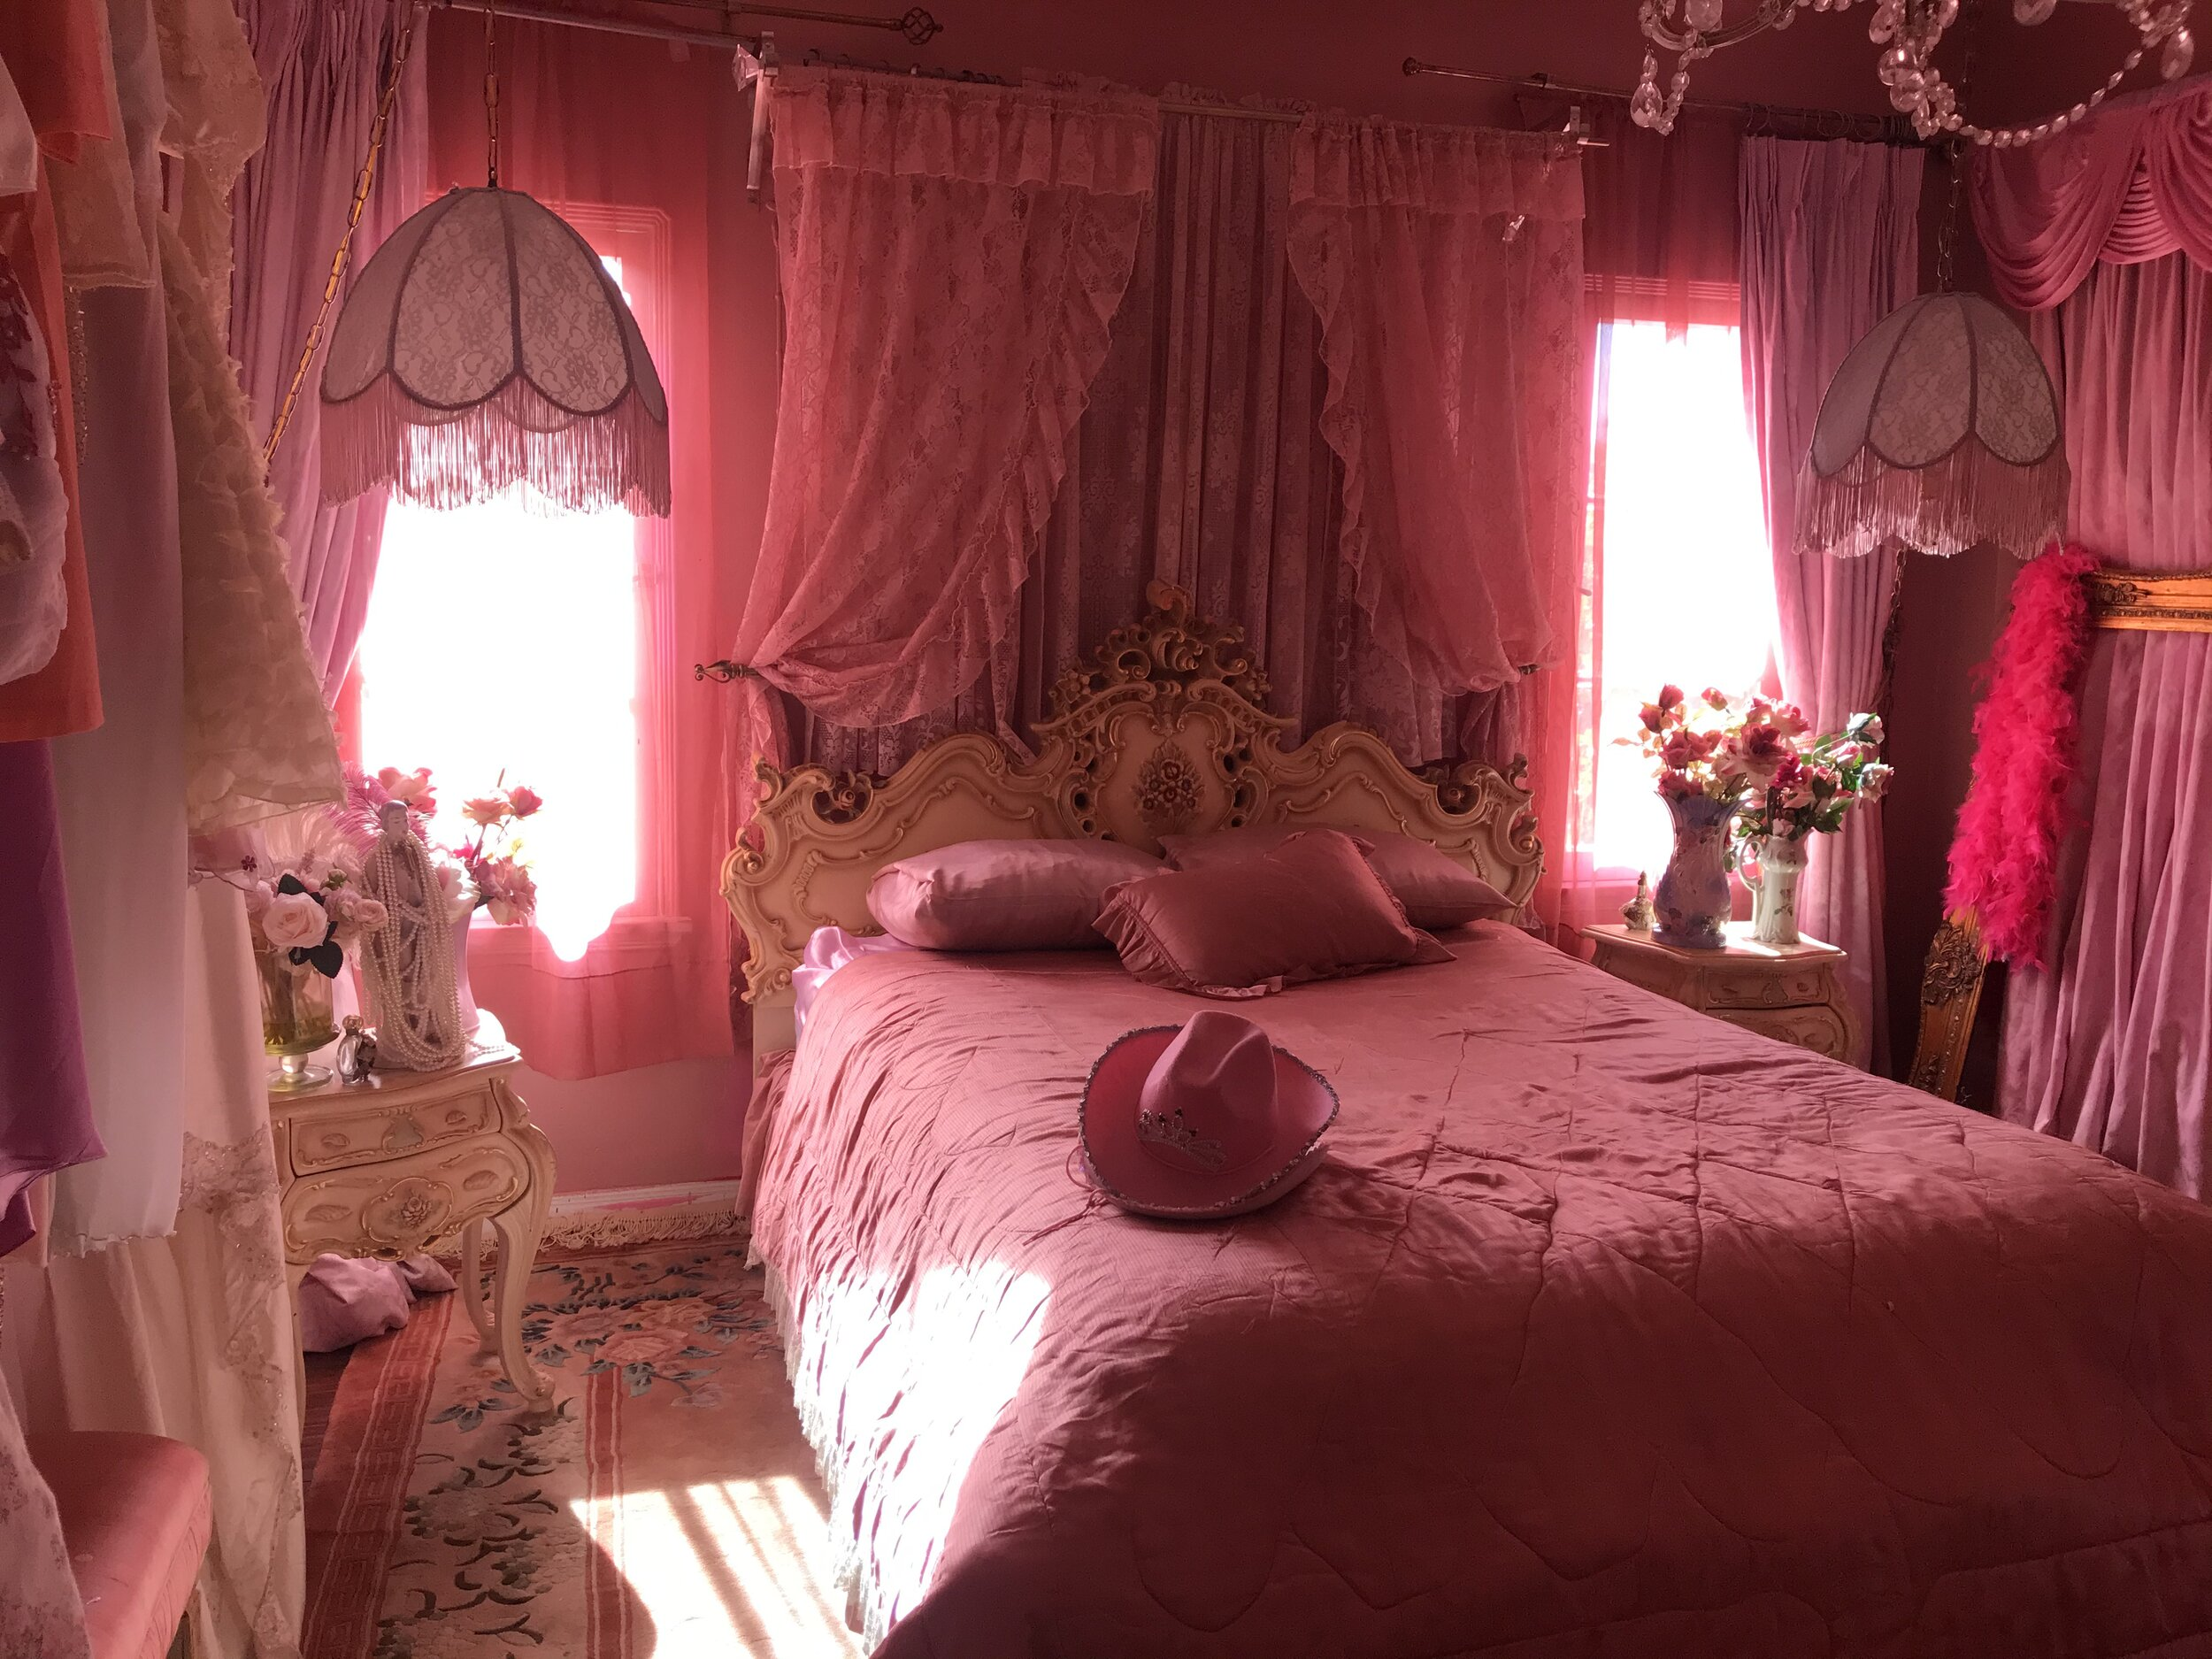 Rooms Ragdoll Pink Palace